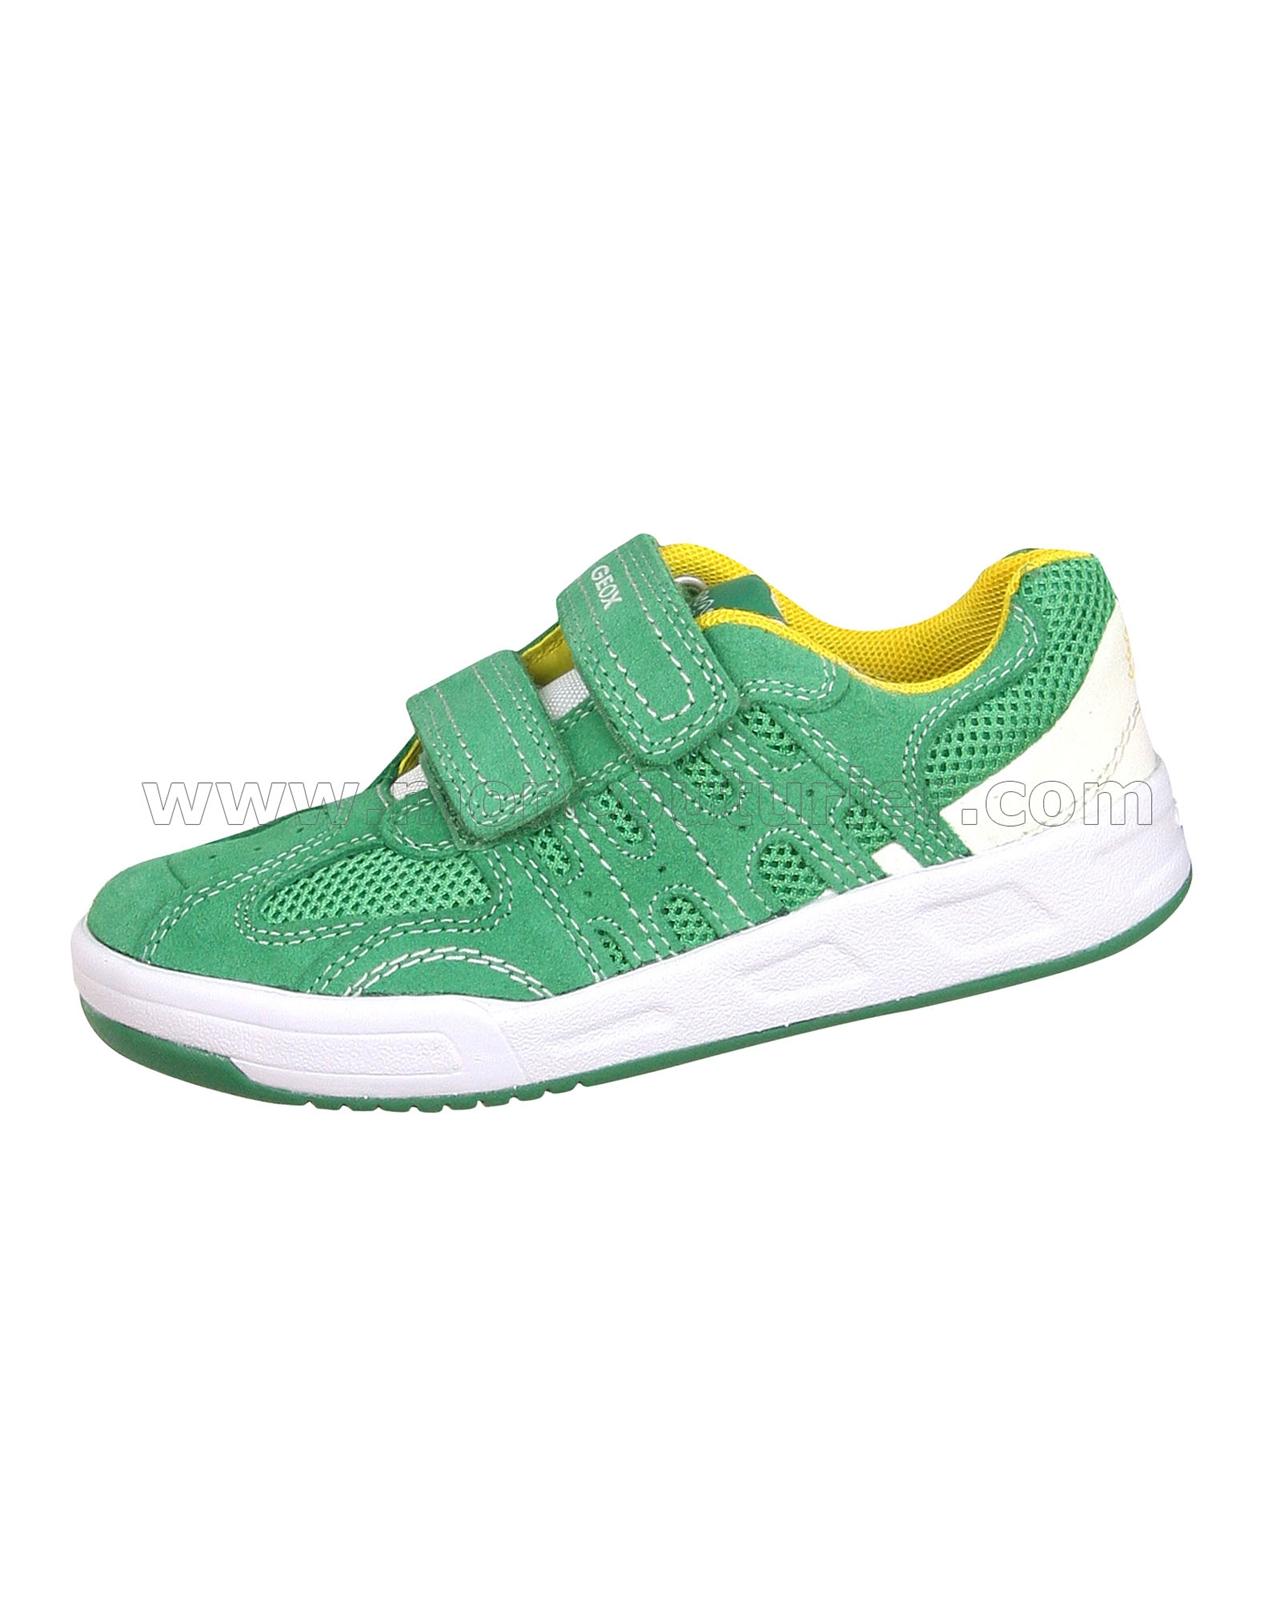 Geox Boys Sneakers Rolk Green